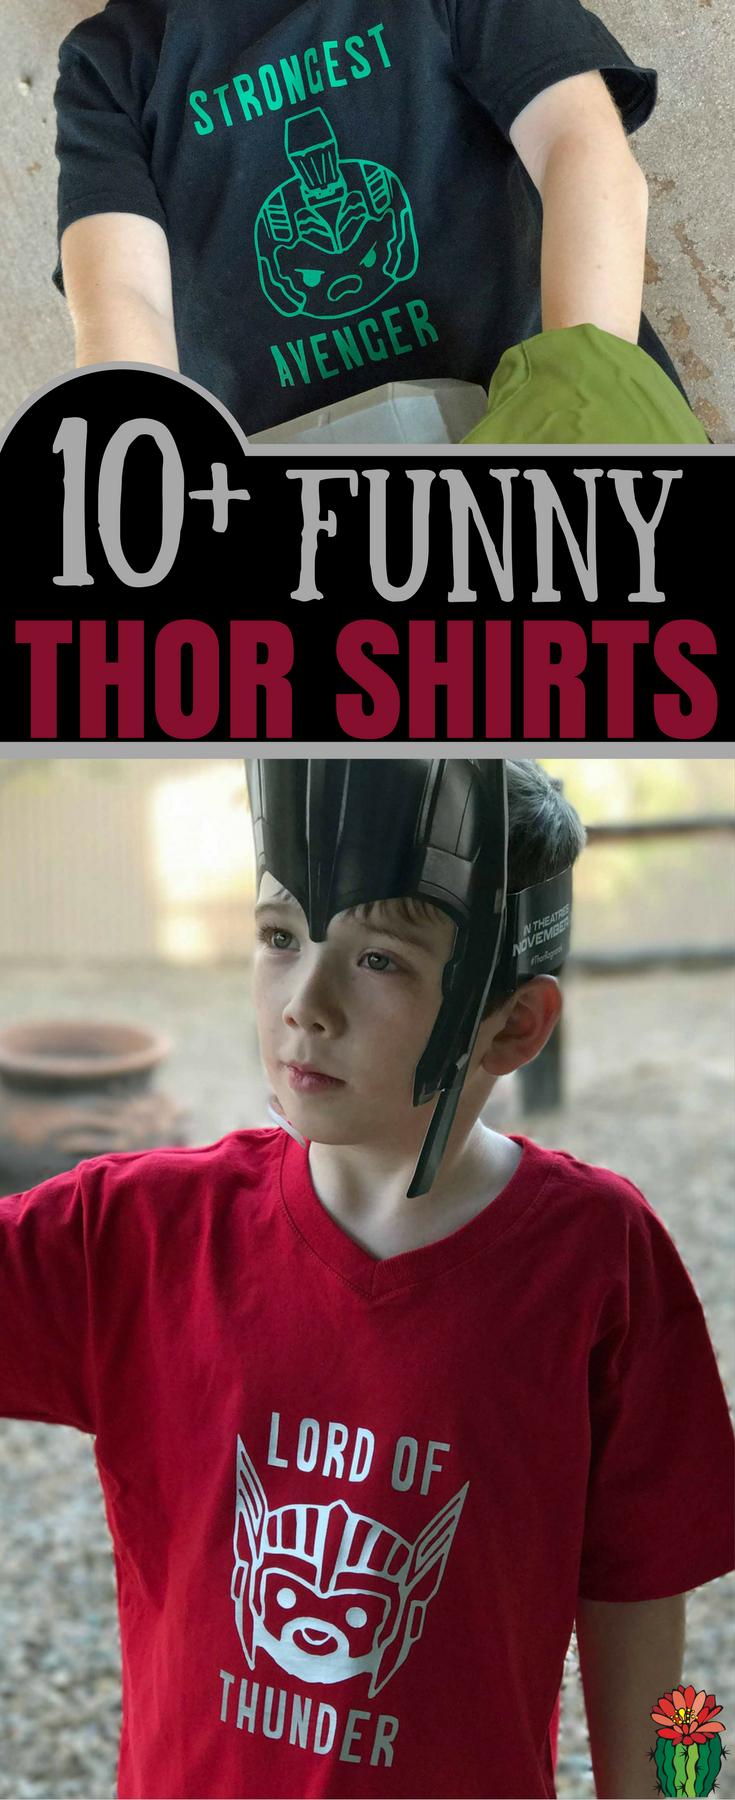 Over 10 Funny Thor Shirt ideas